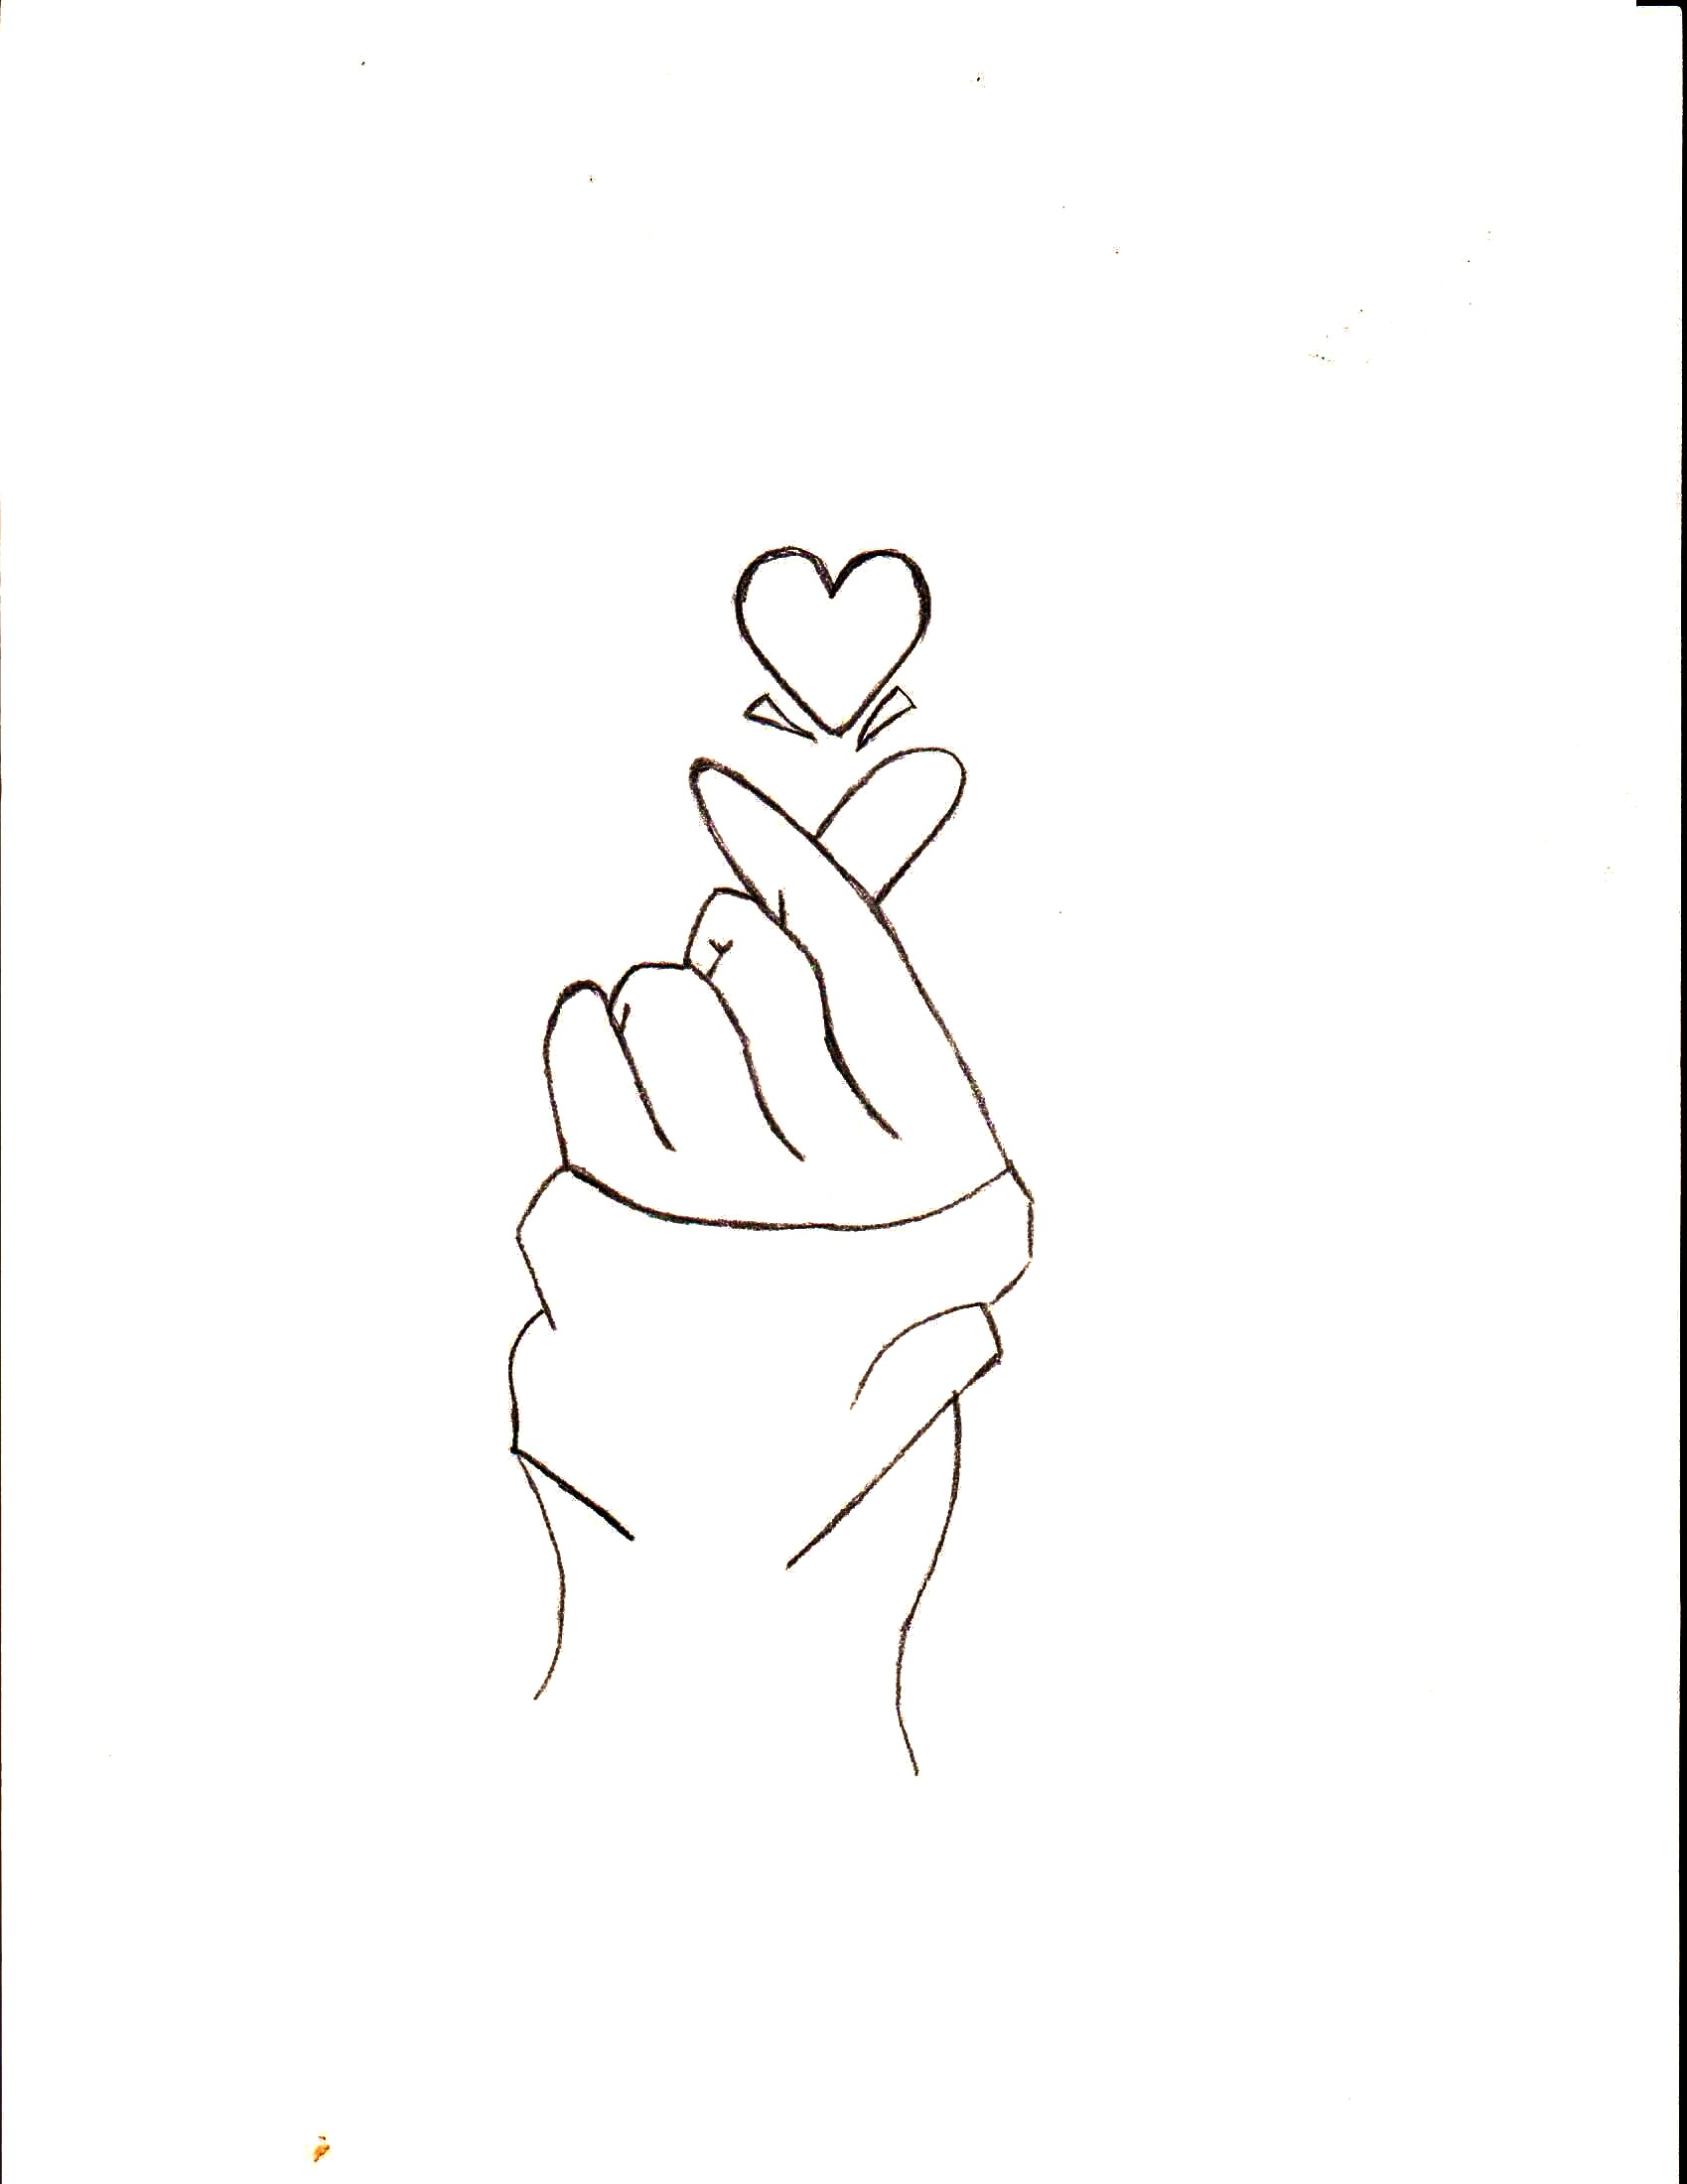 Раскраска рука и сердце